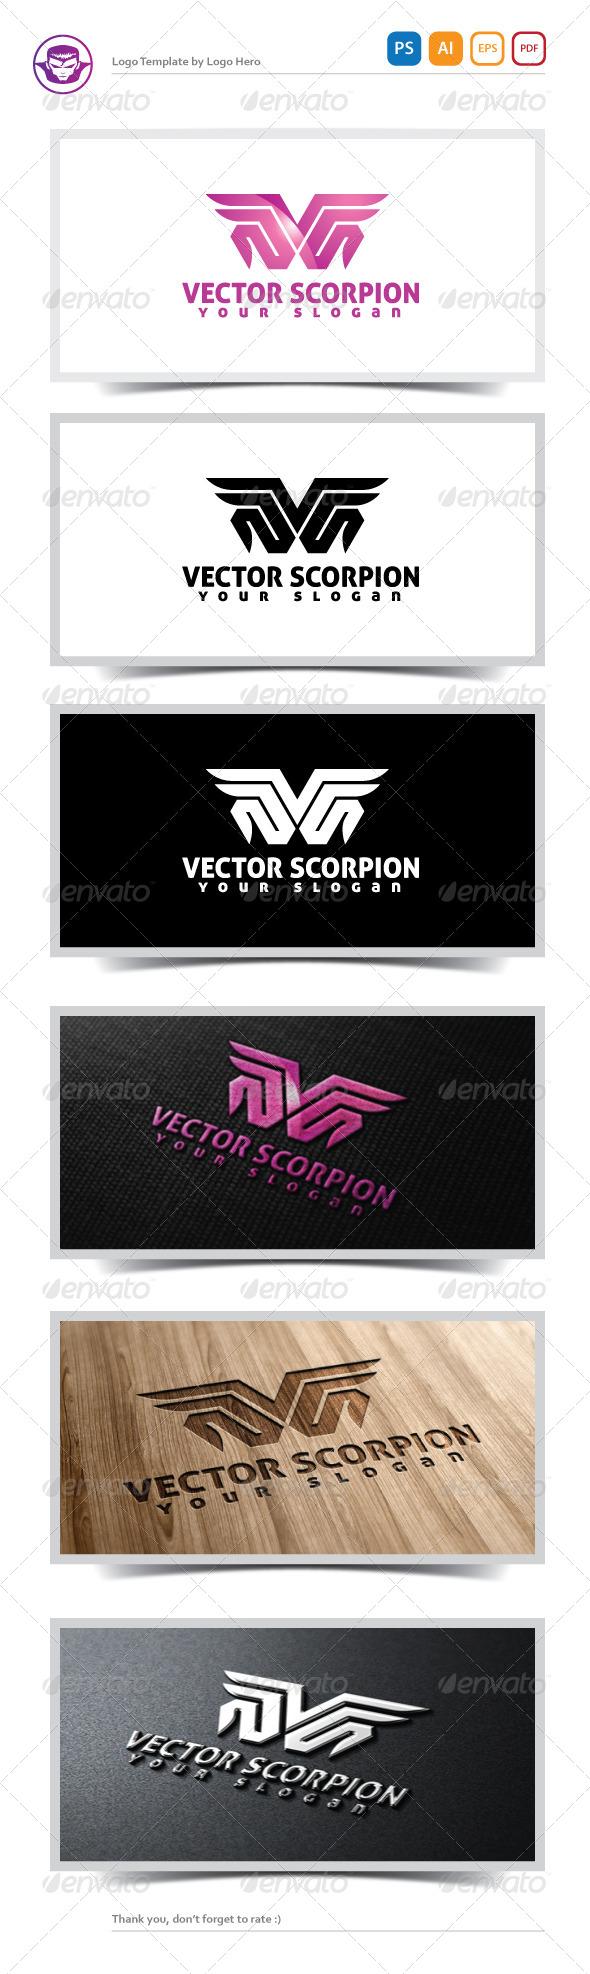 Vector Scorpion Logo Template